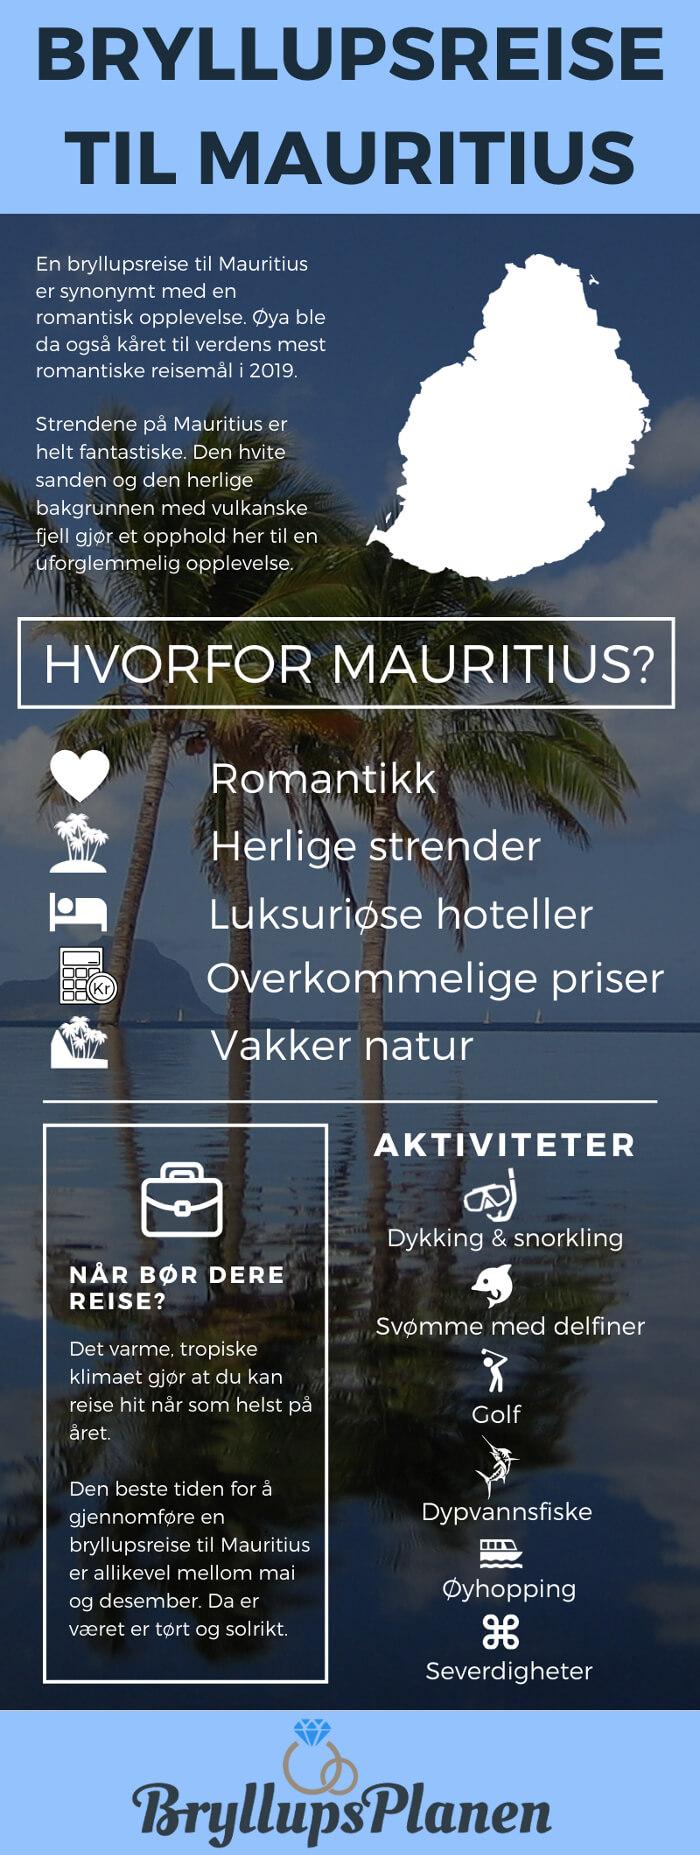 Infographic - Bryllupsreise til Mauritius